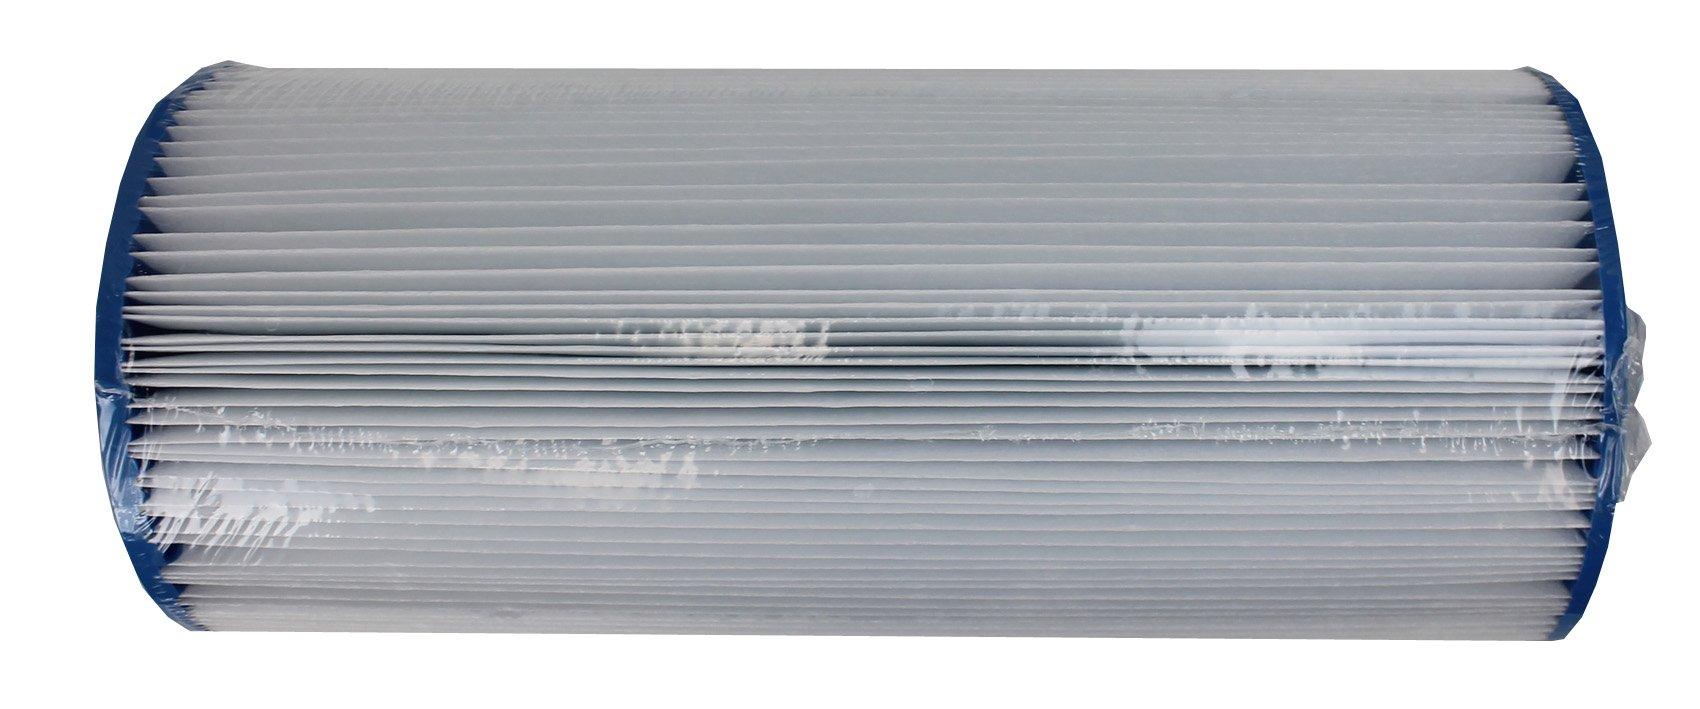 2 Unicel 6CH-960 Jacuzzi Premium Replacement Pool Spa Filter Cartridges 6540-476